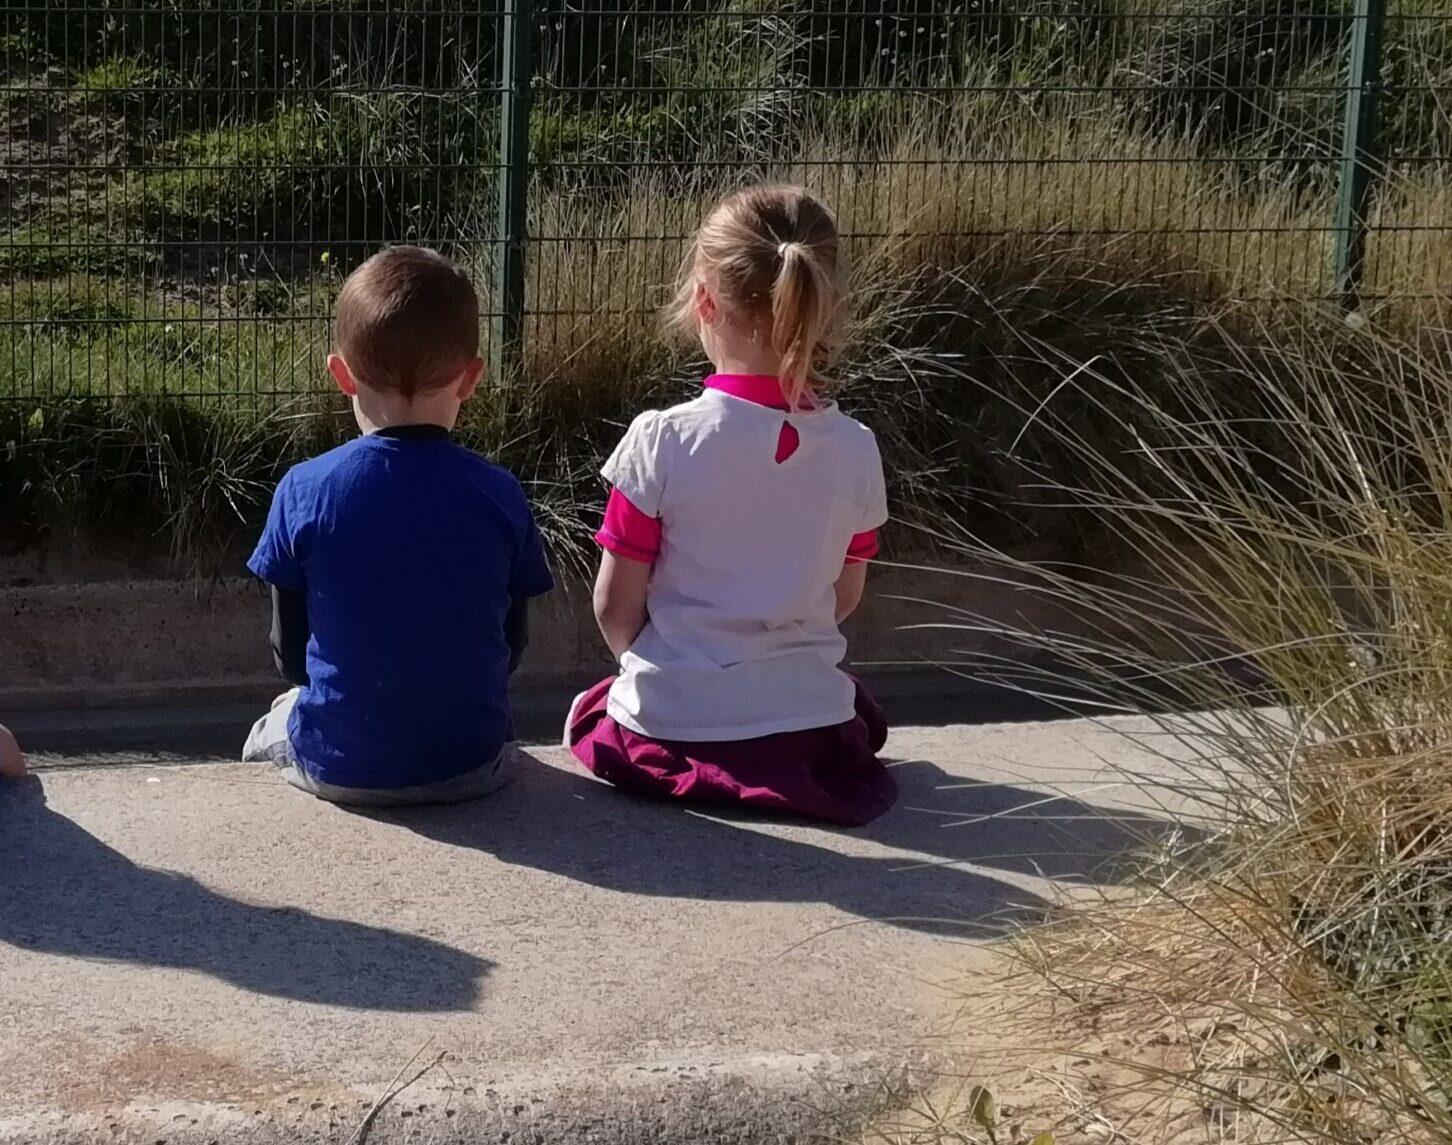 Boy and girl at beach